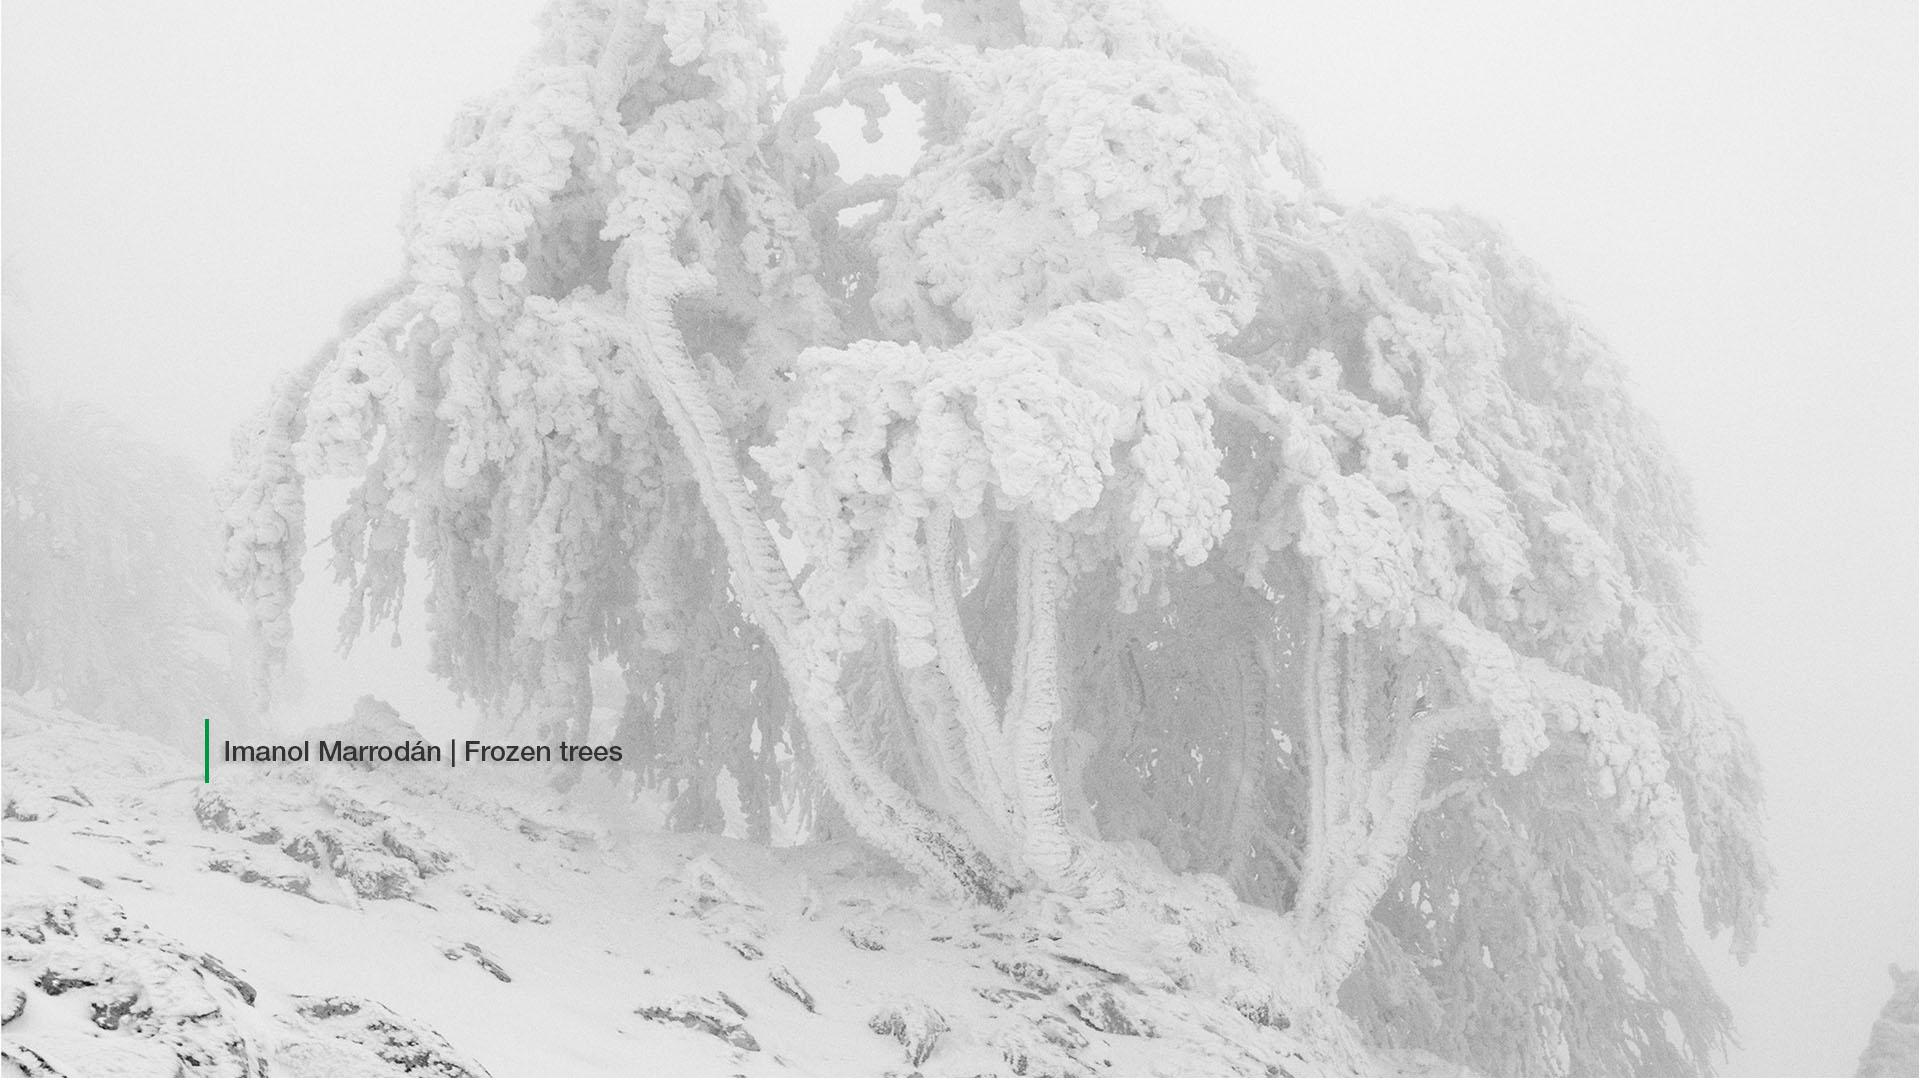 SLIDER 8 Imanol Marrodan Frozen Trees